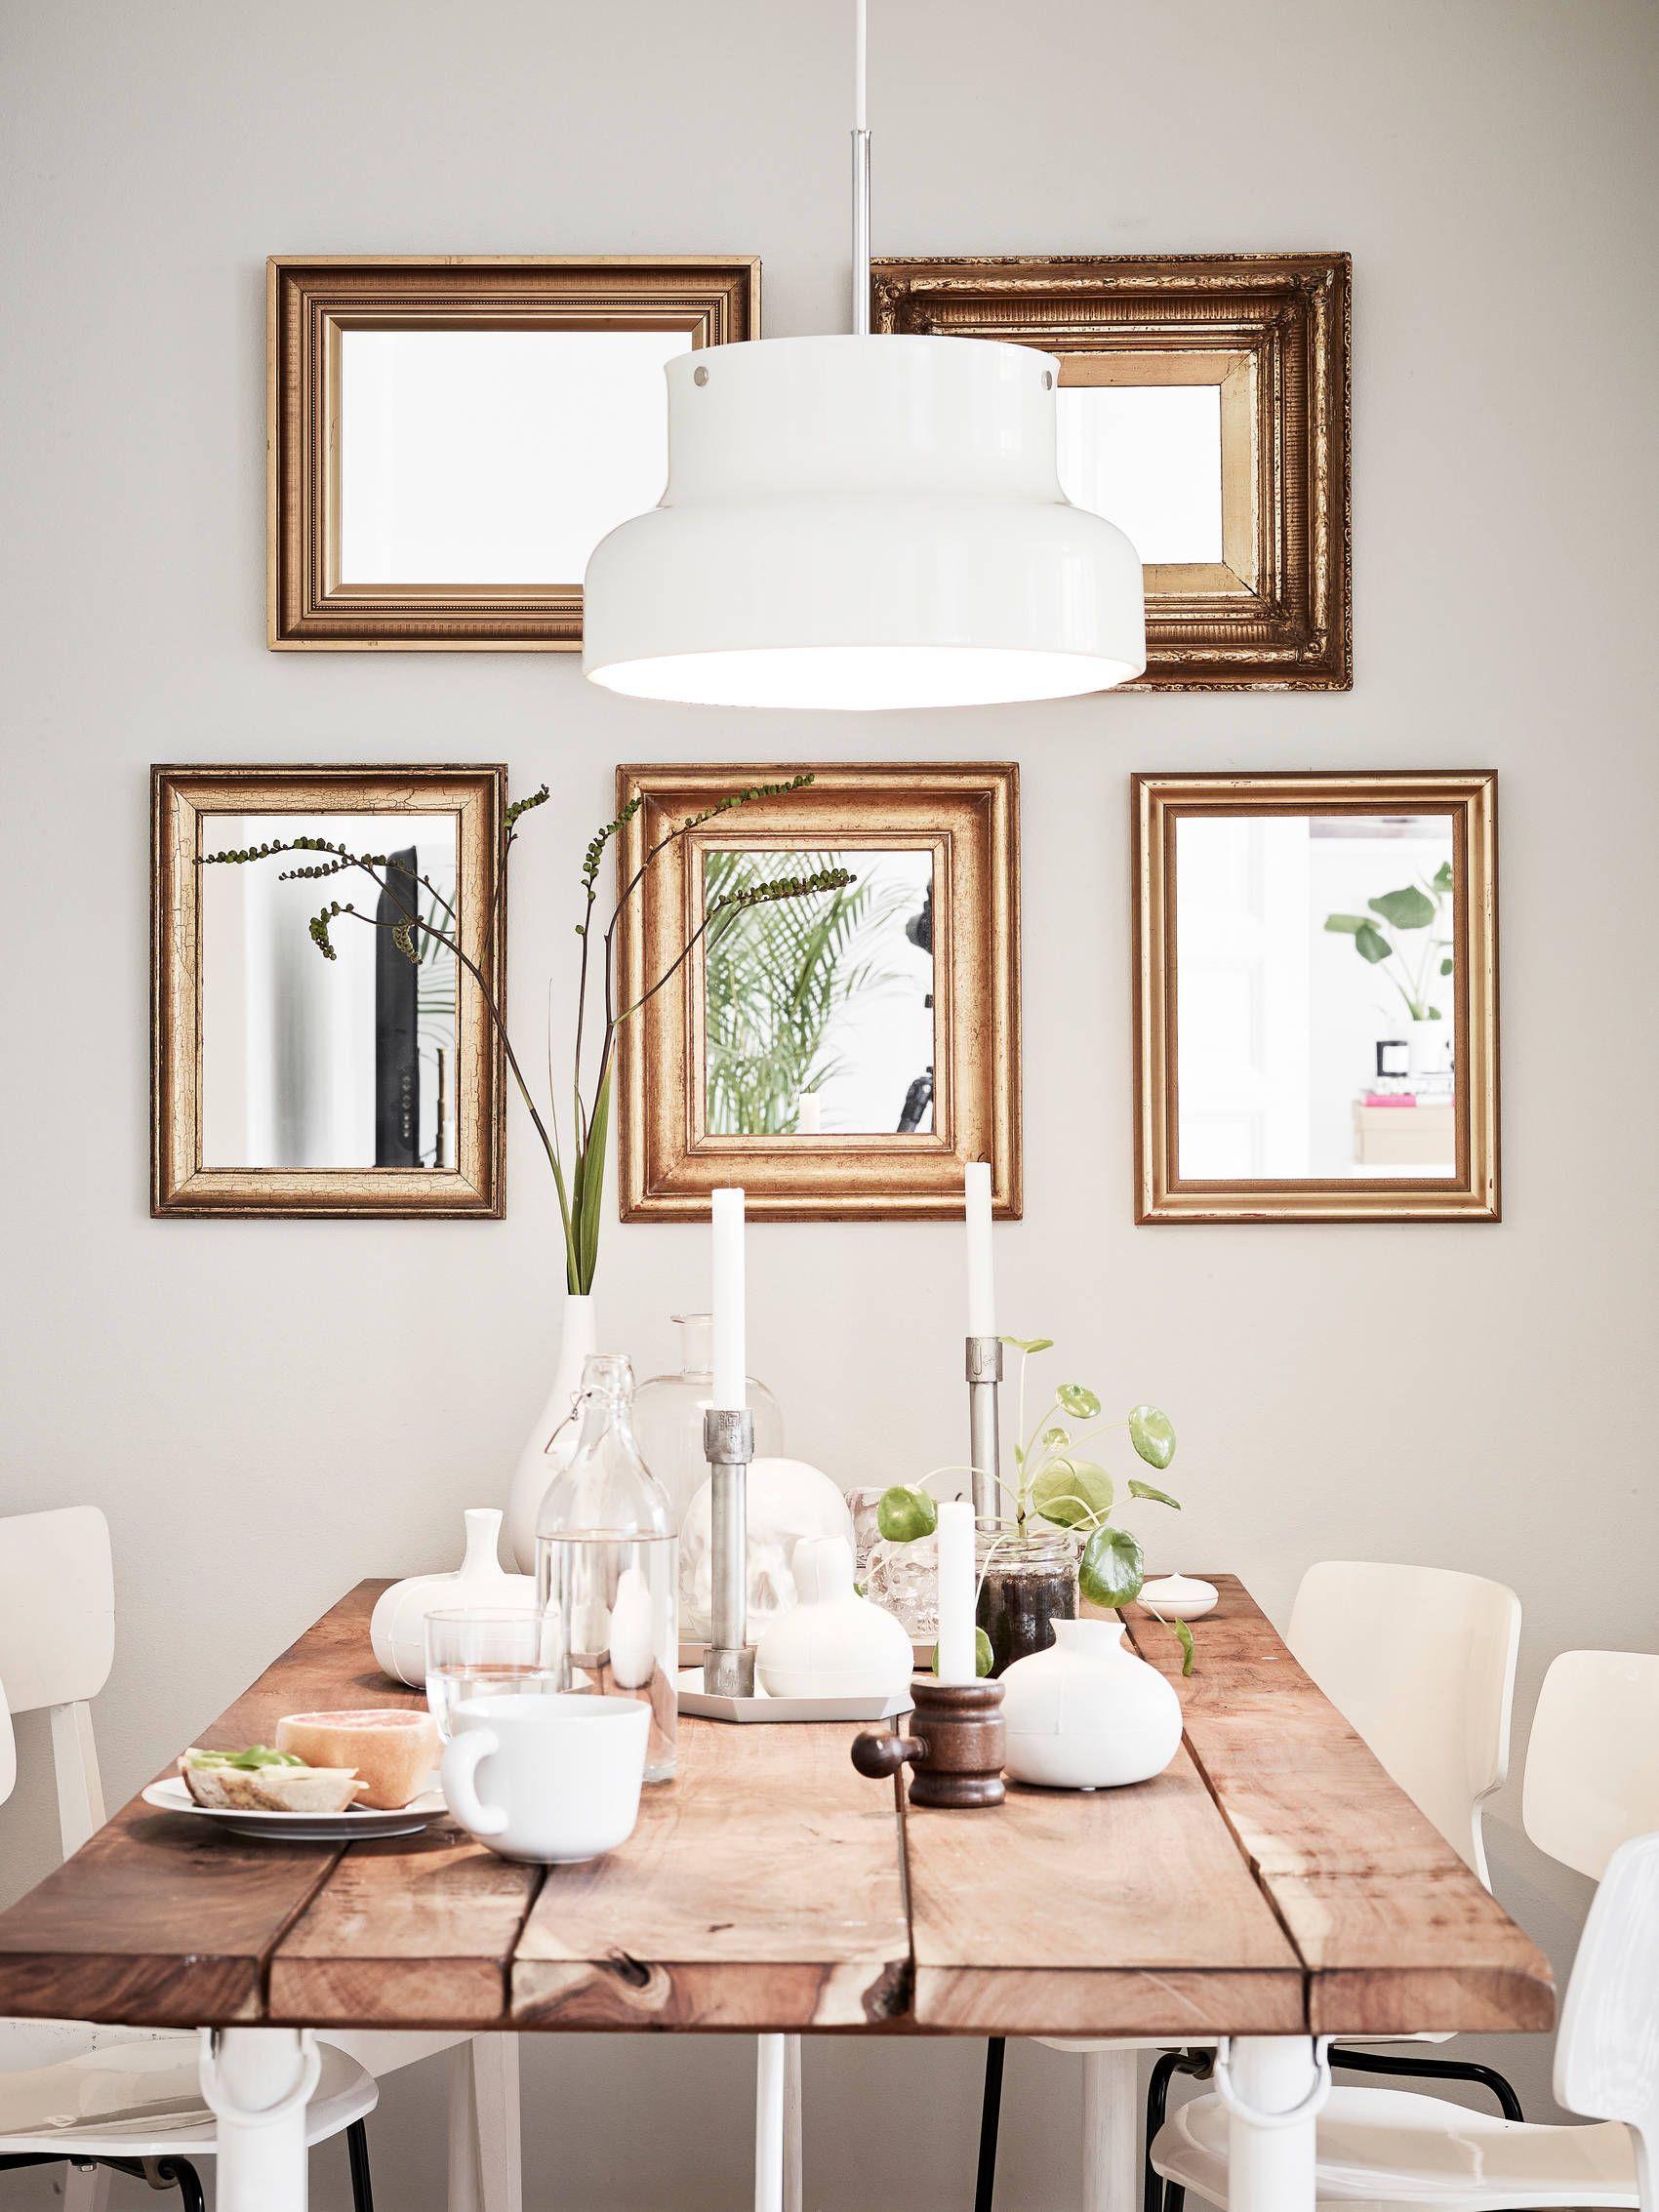 Beste einfache wohngestaltung södra vägen  vån   stadshem  home sweet home  pinterest